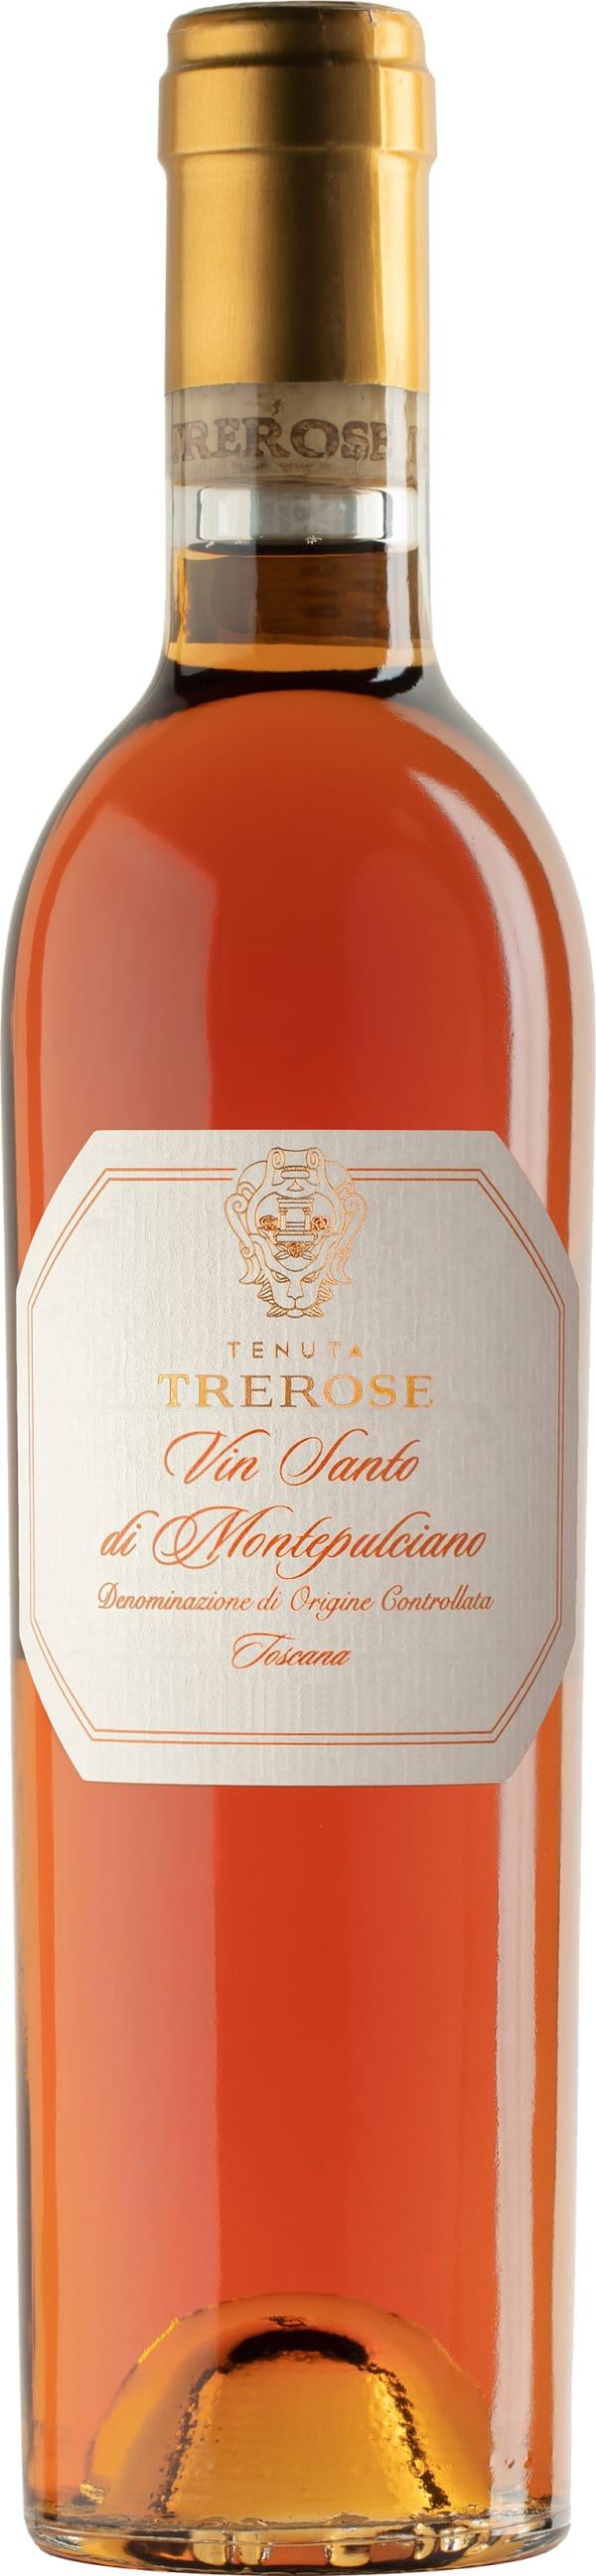 TreRose Vin Santo di Montepulciano 2010